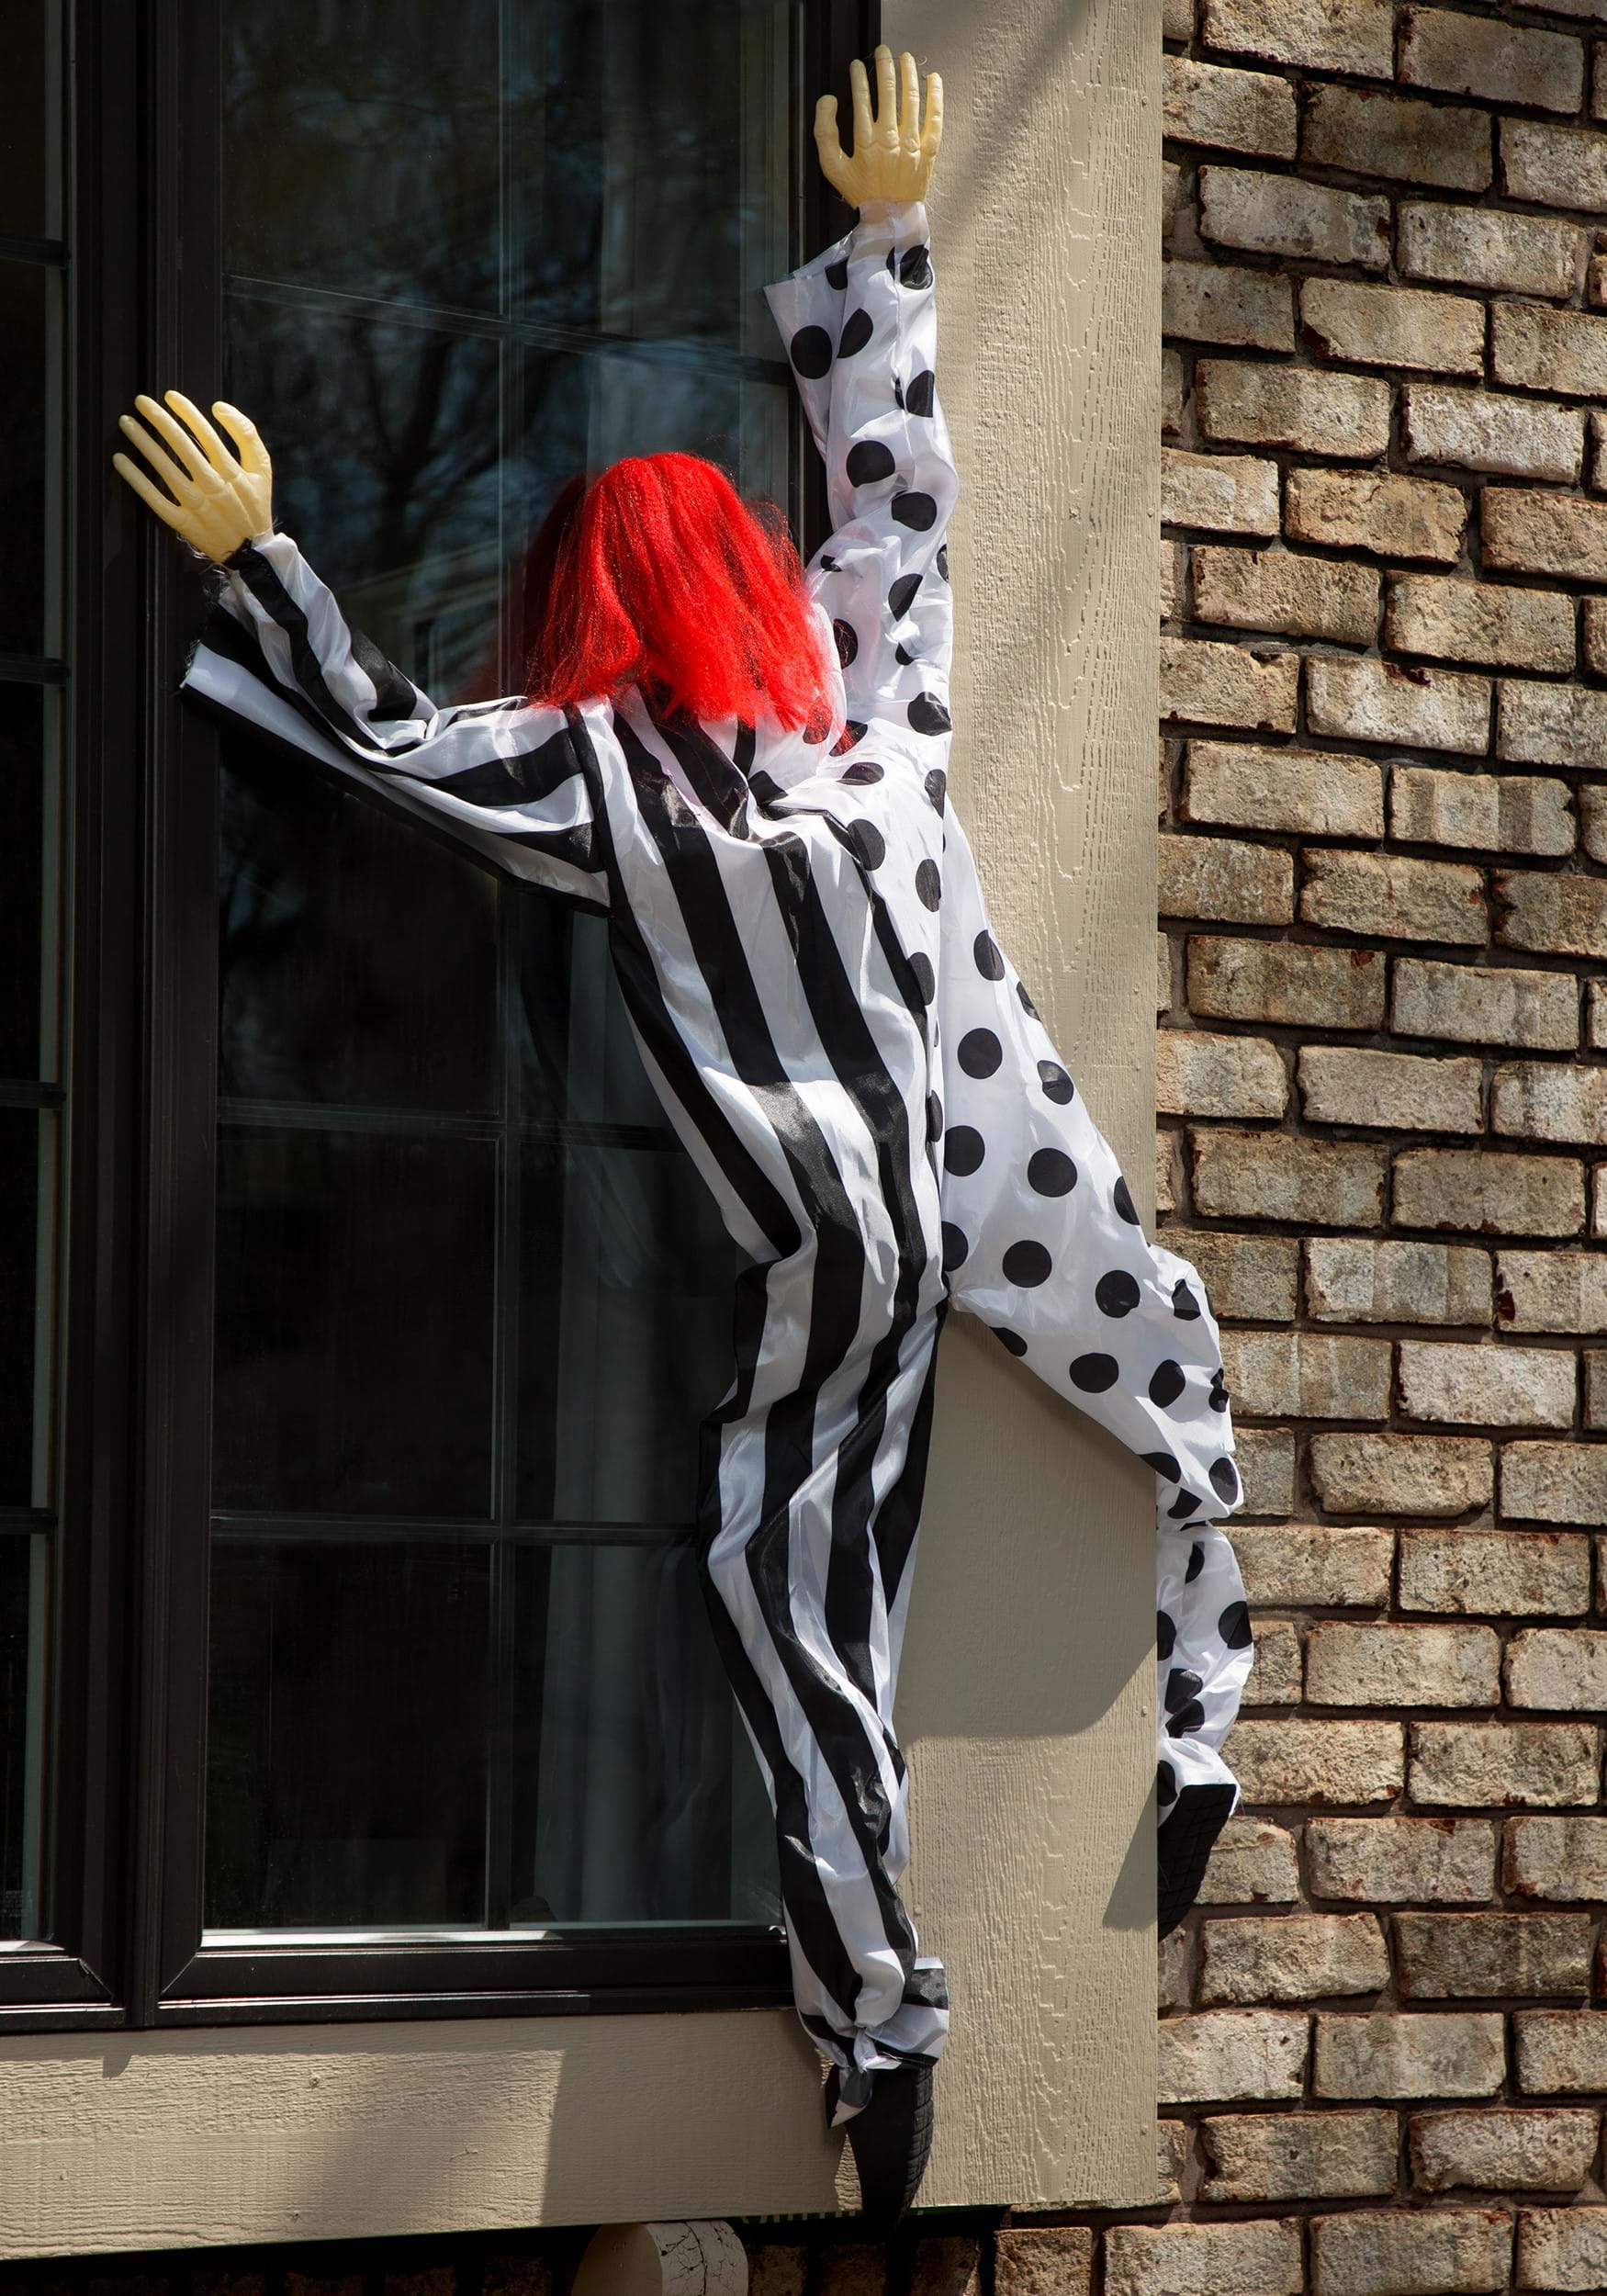 Killer clown window hanging decoration for Clown dekoration